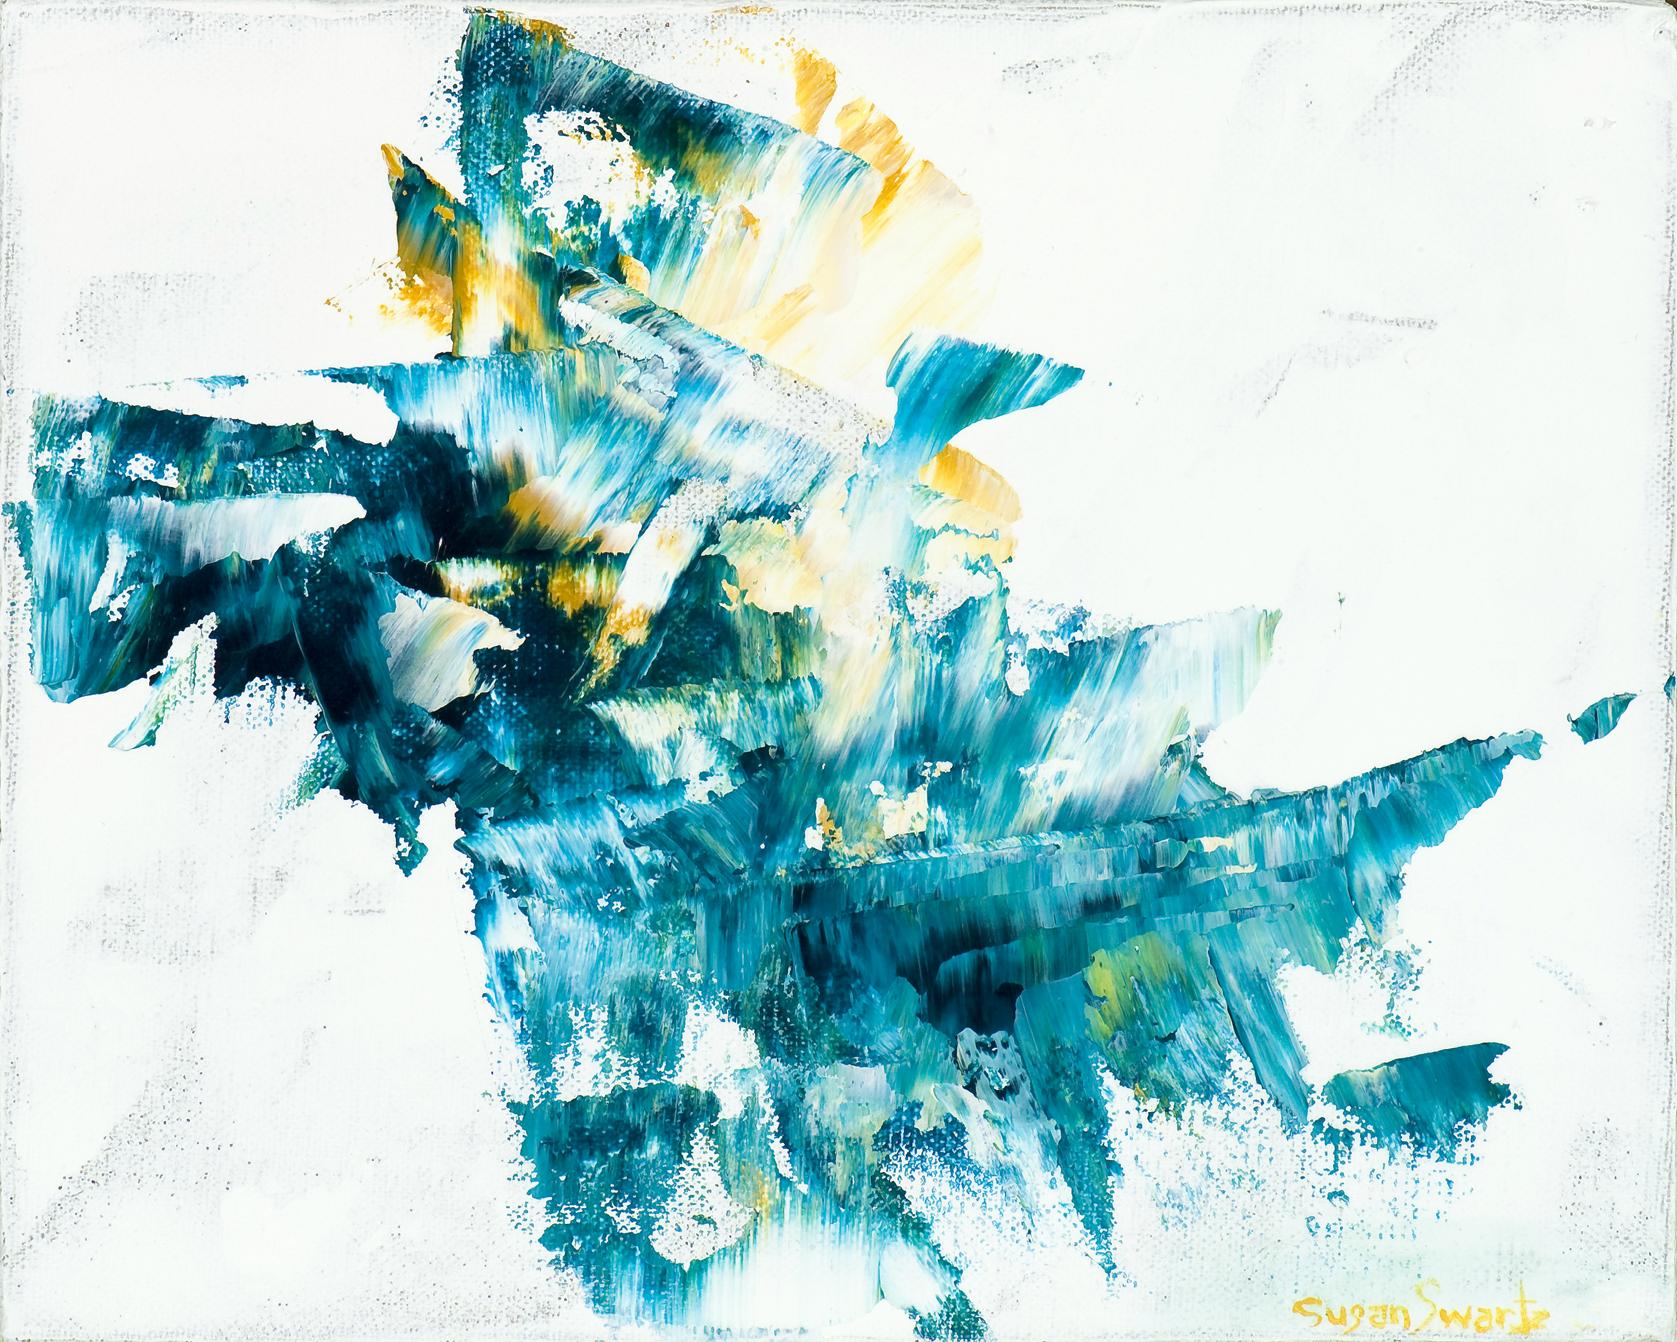 Untitled 012 10 x 8